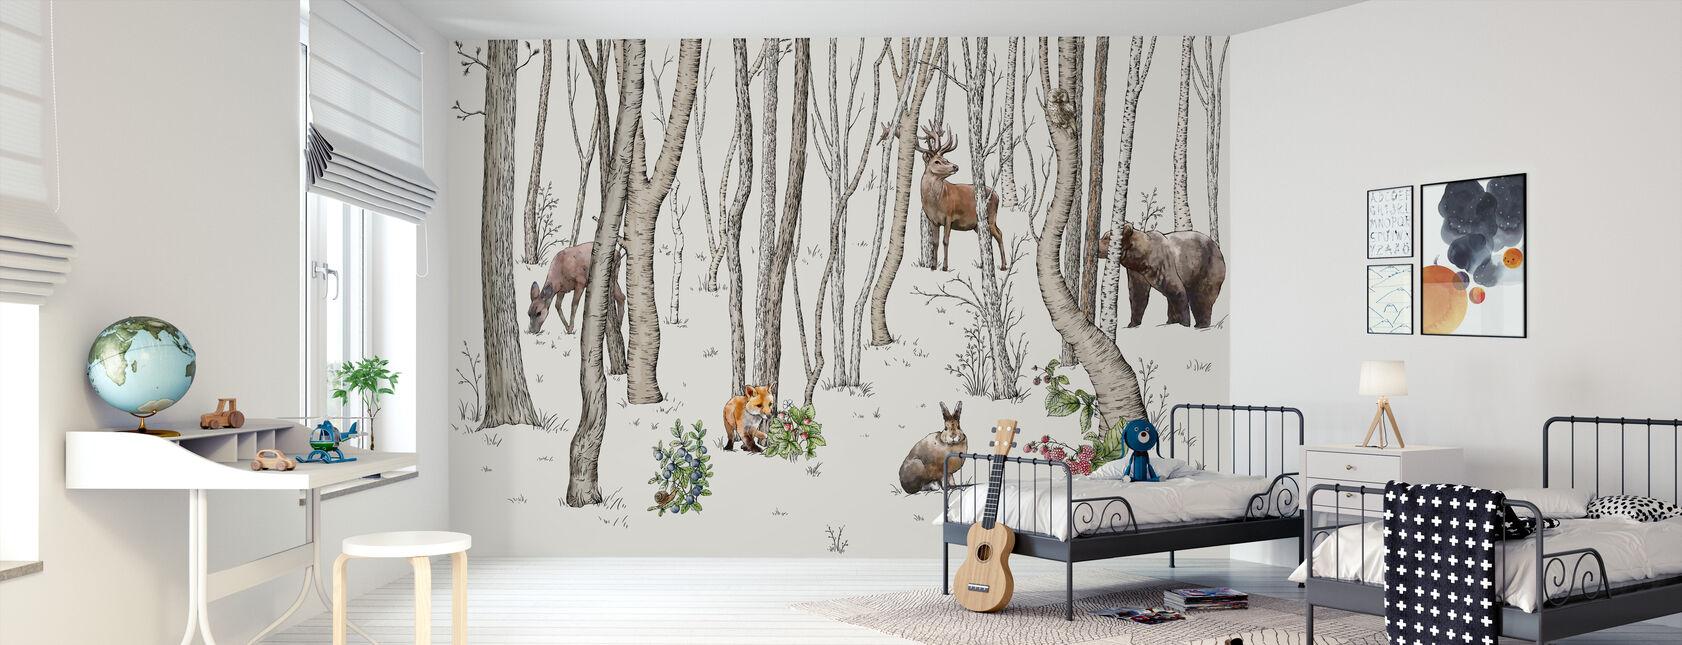 Dieren van het bos - Behang - Kinderkamer